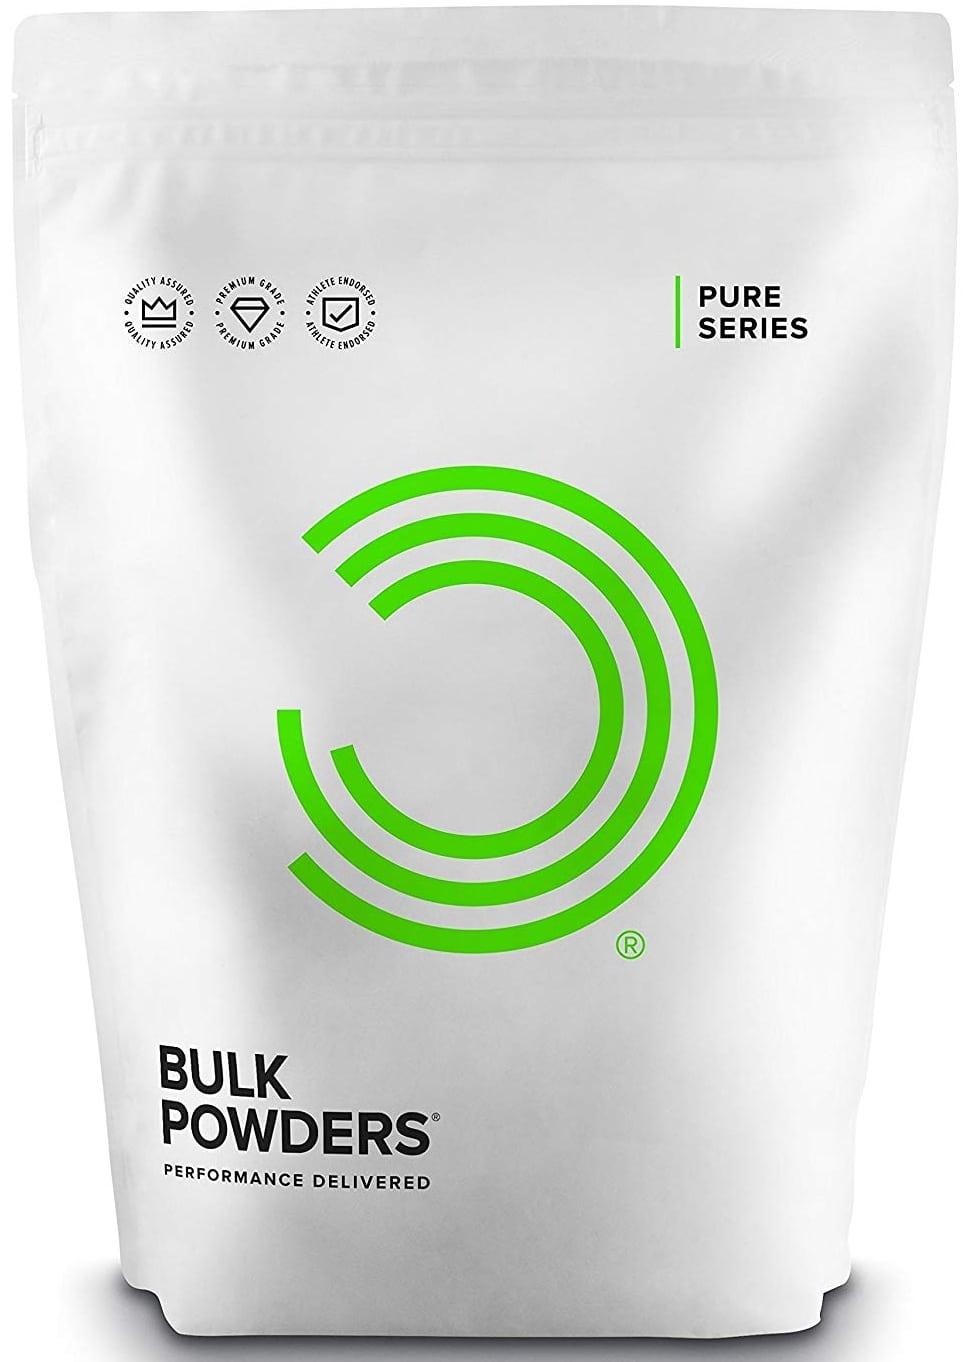 Bulk Powders Pure Whey test